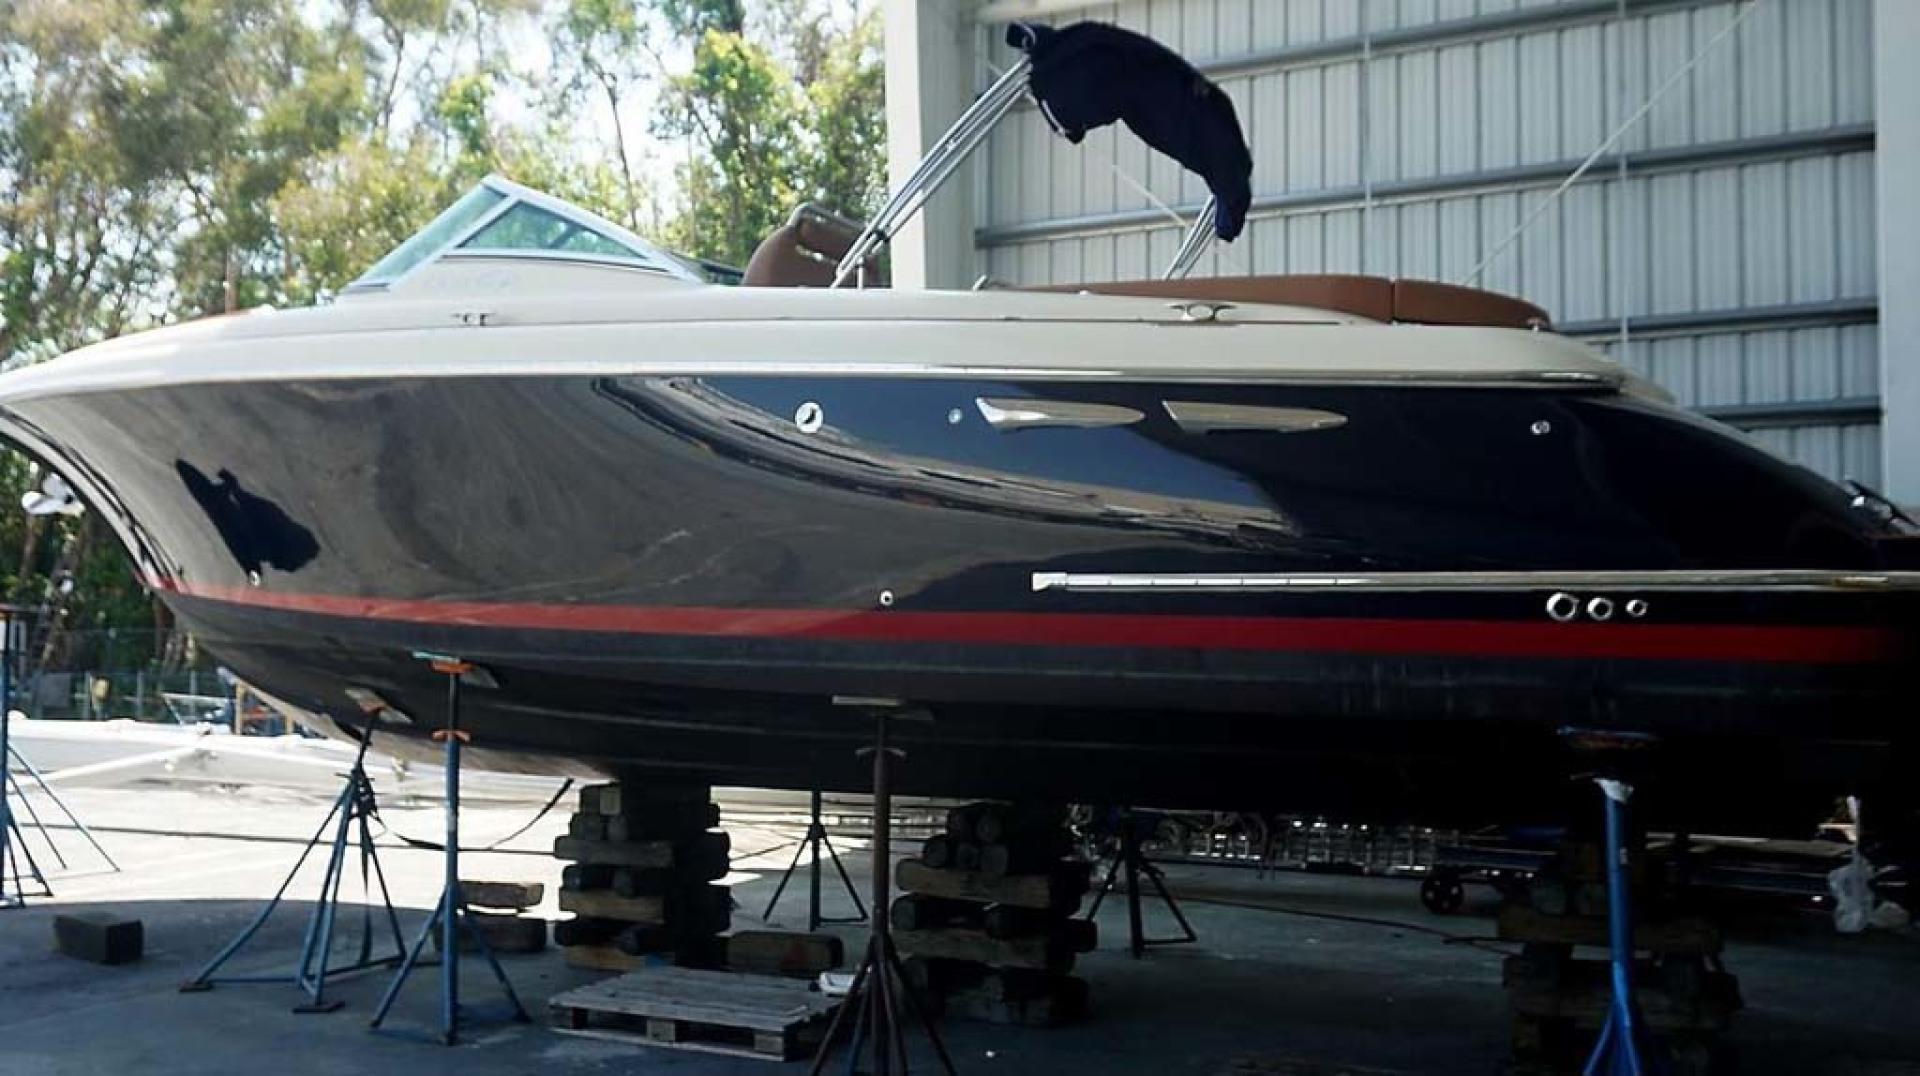 Chris-Craft-Corsair 36 2013-La Dolce Vita Fort Lauderdale-Florida-United States-Hauled Out-1074579 | Thumbnail